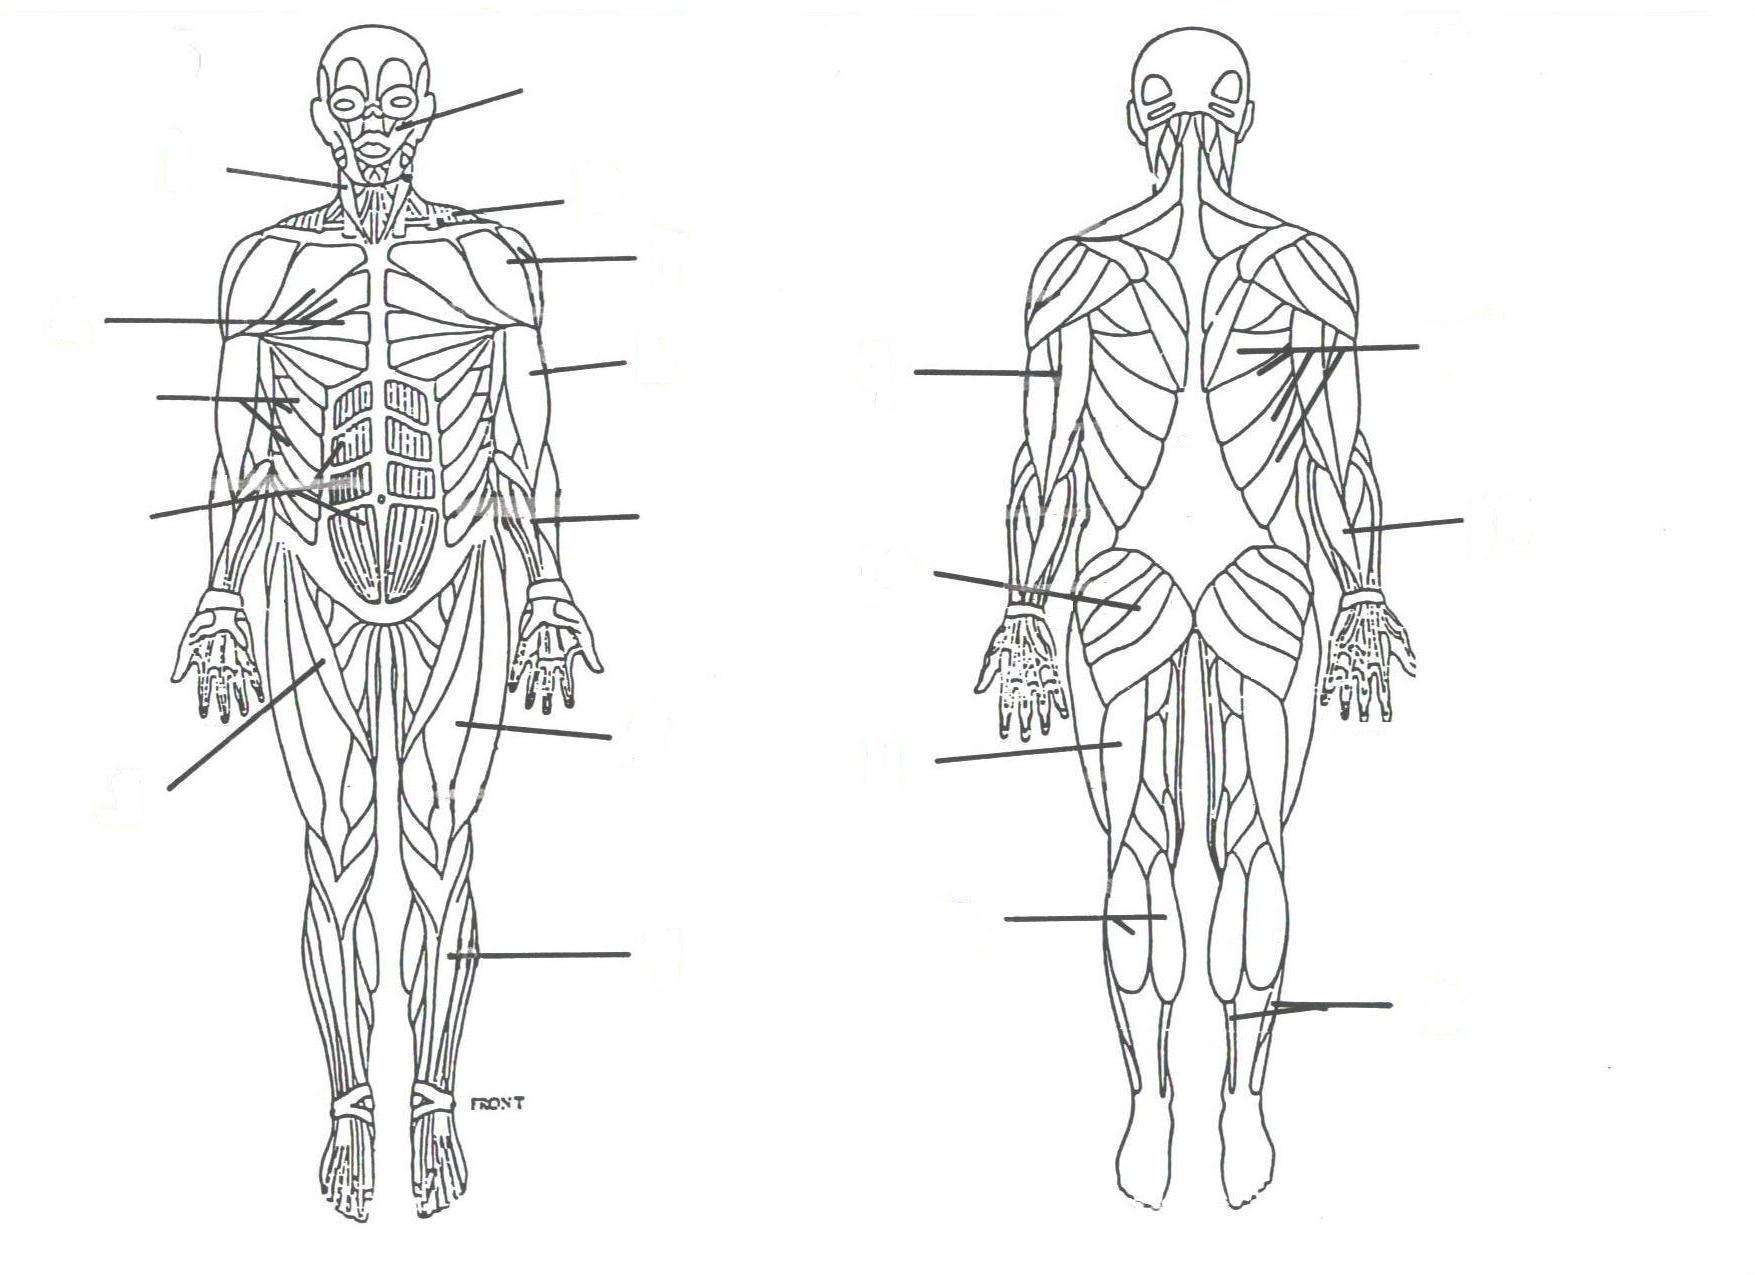 hight resolution of muscular system diagram labeled for kids muscular system diagram labeled for kids muscular system diagram